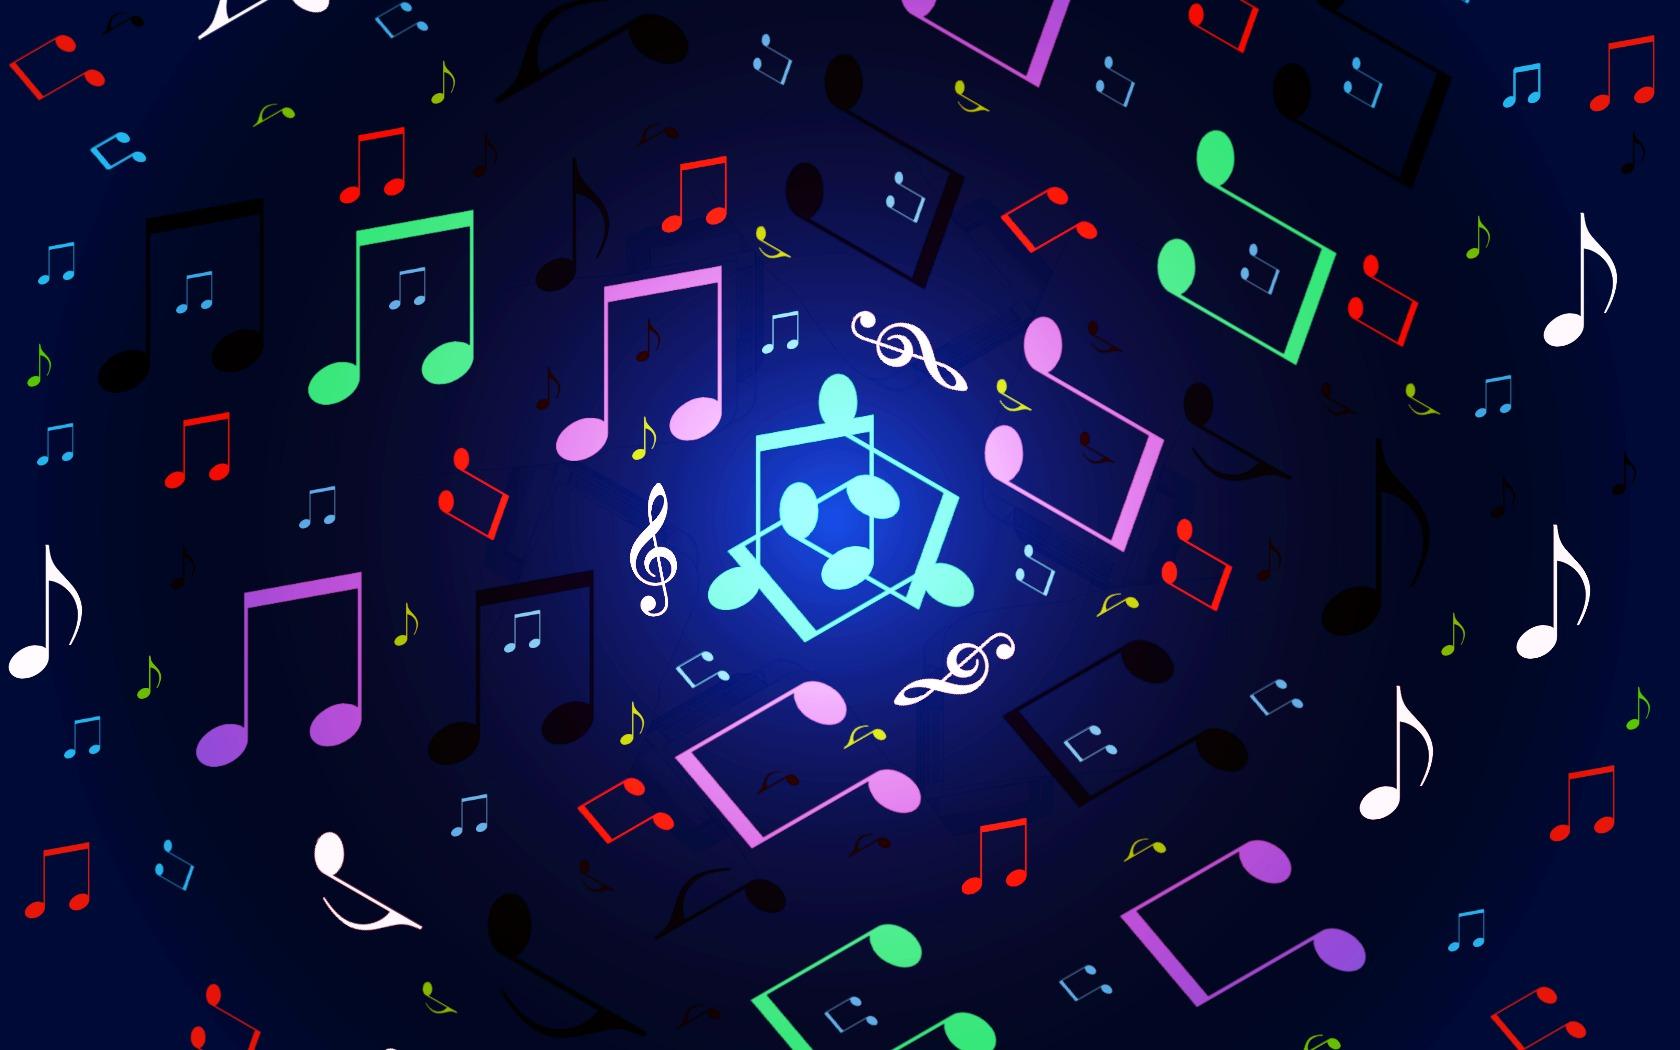 Hd wallpaper music - Music Notes Wallpaper 10195 Hd Wallpapers In Music Imagesci Com